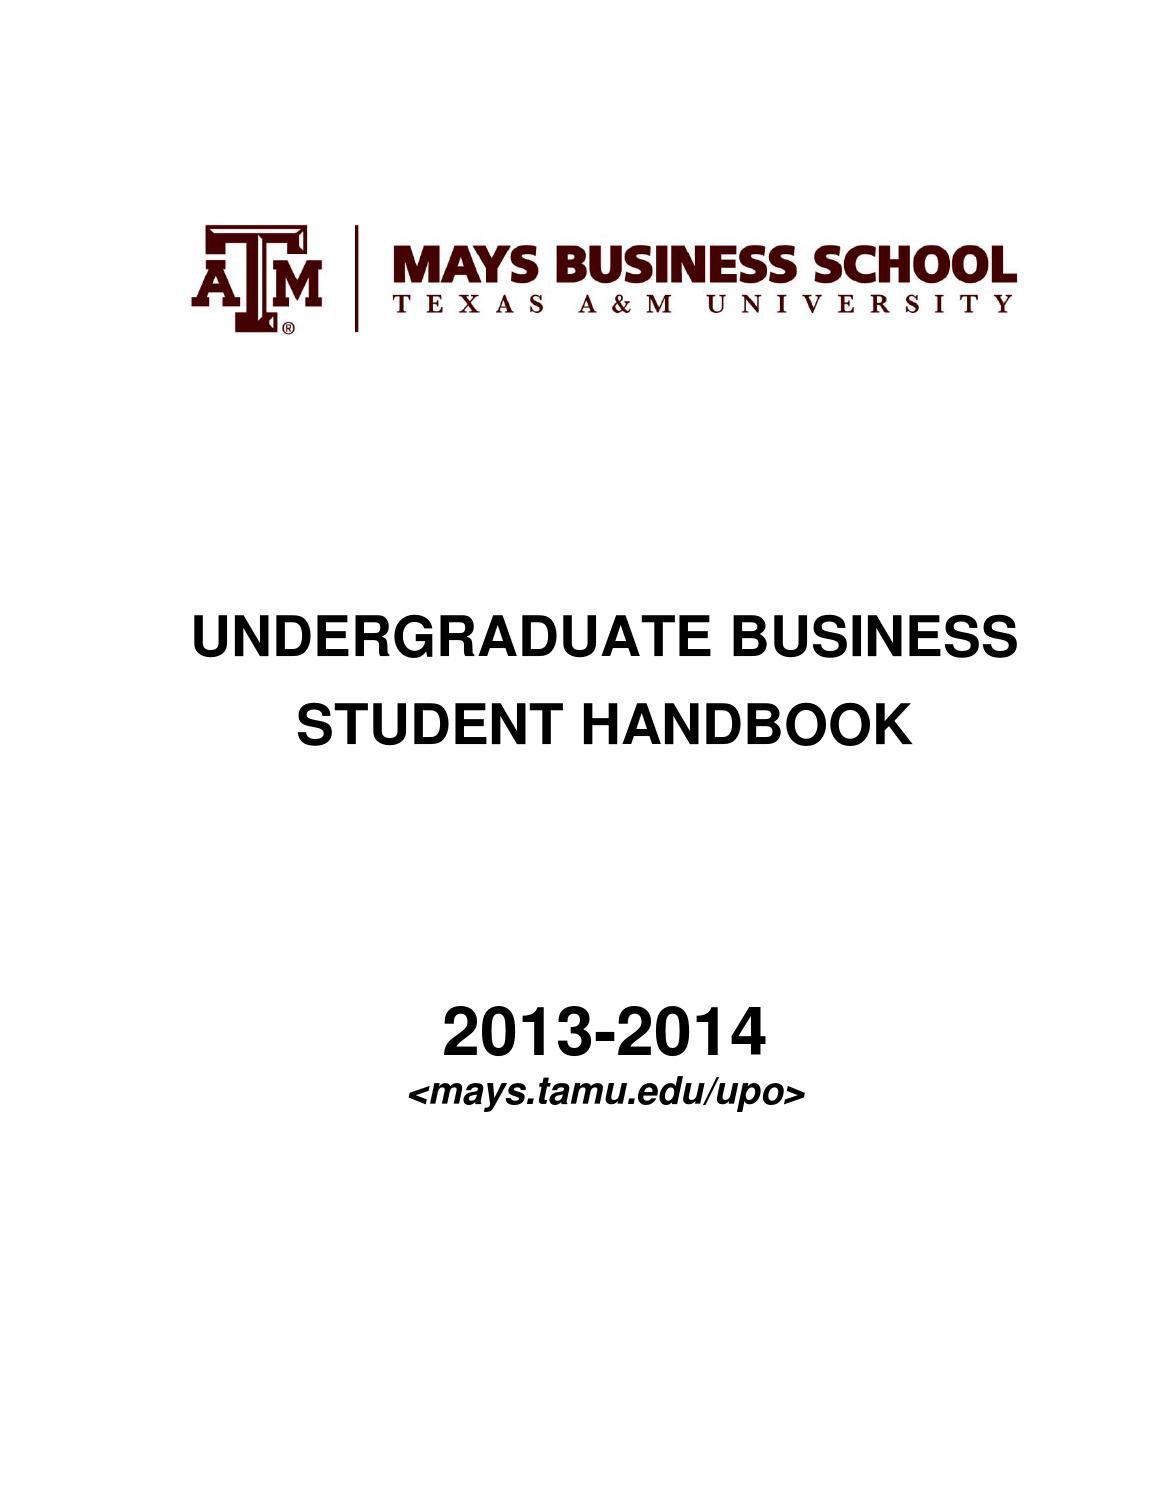 2012-2013 Undergraduate Student Handbook by Mays Business